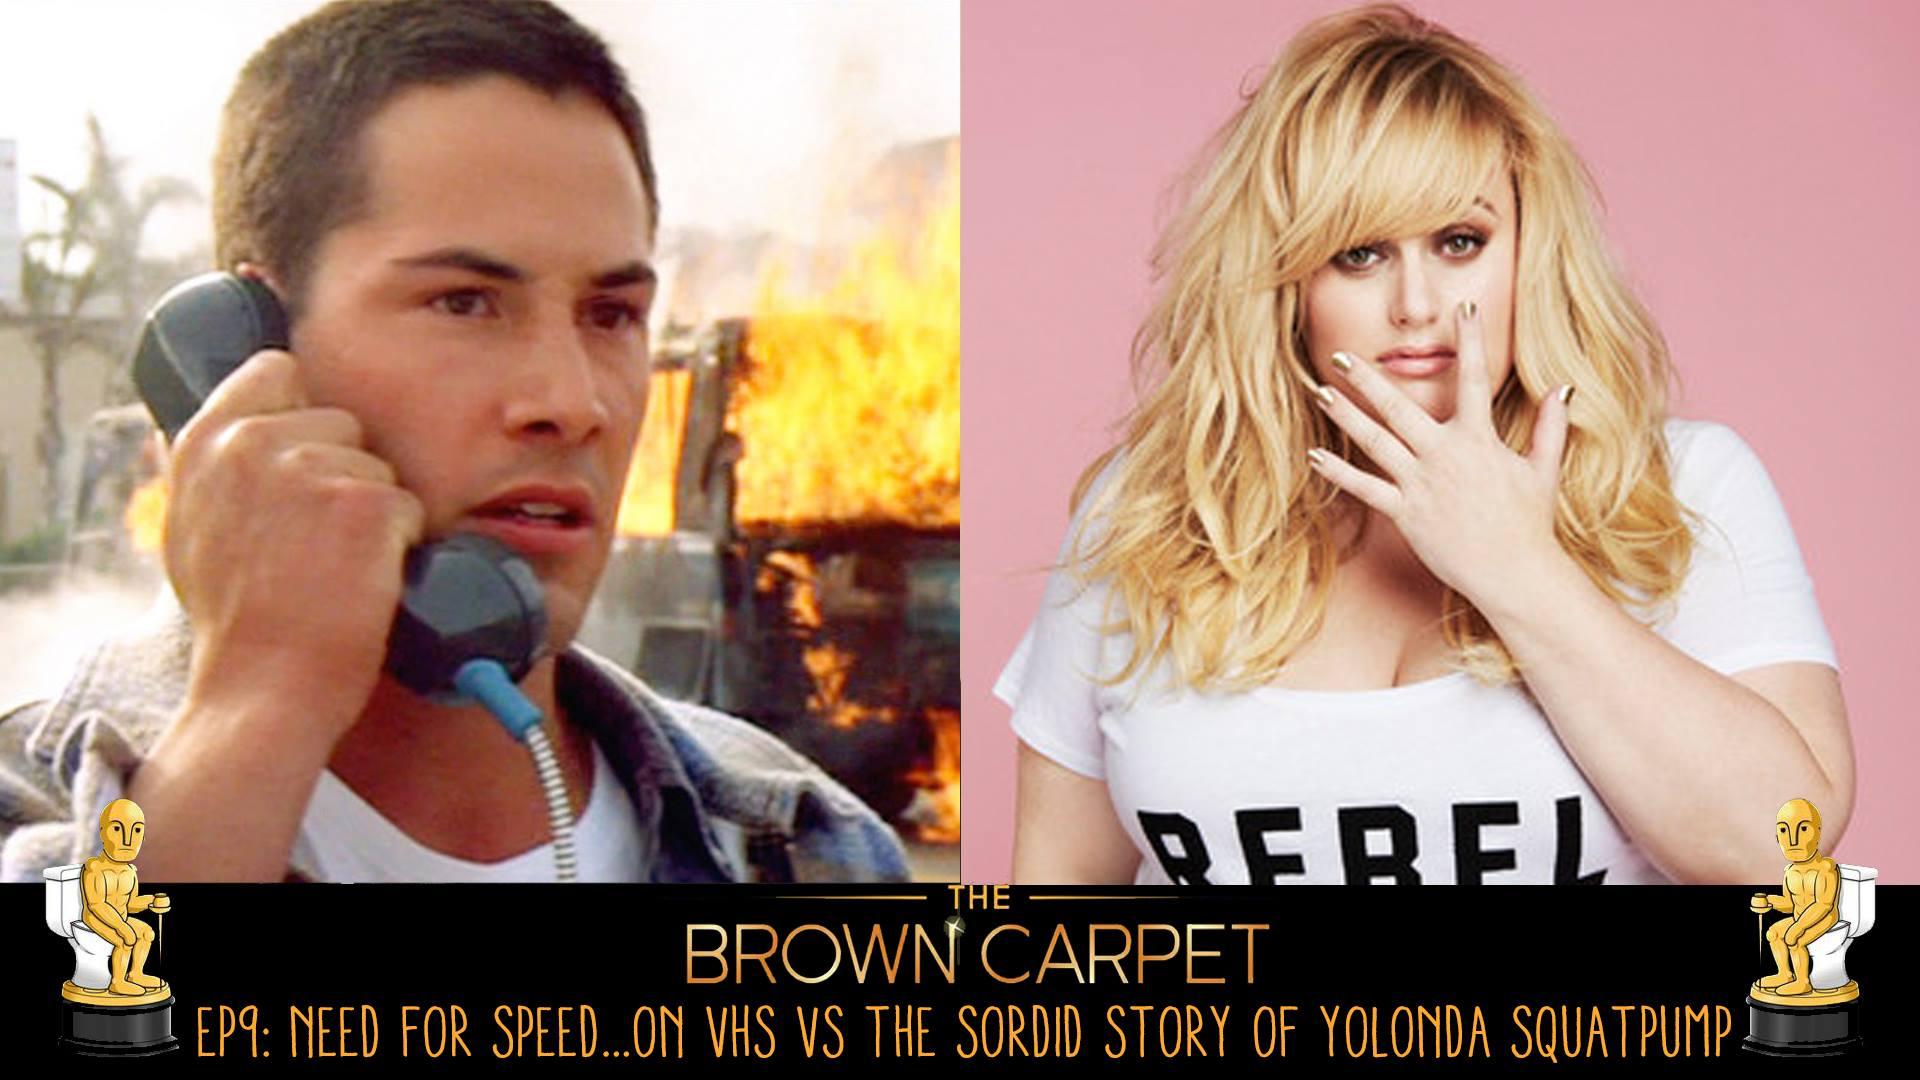 15/01/18 - E09 - Need for Speed.. on VHS vs The Sordid Story of Yolanda Squatpump